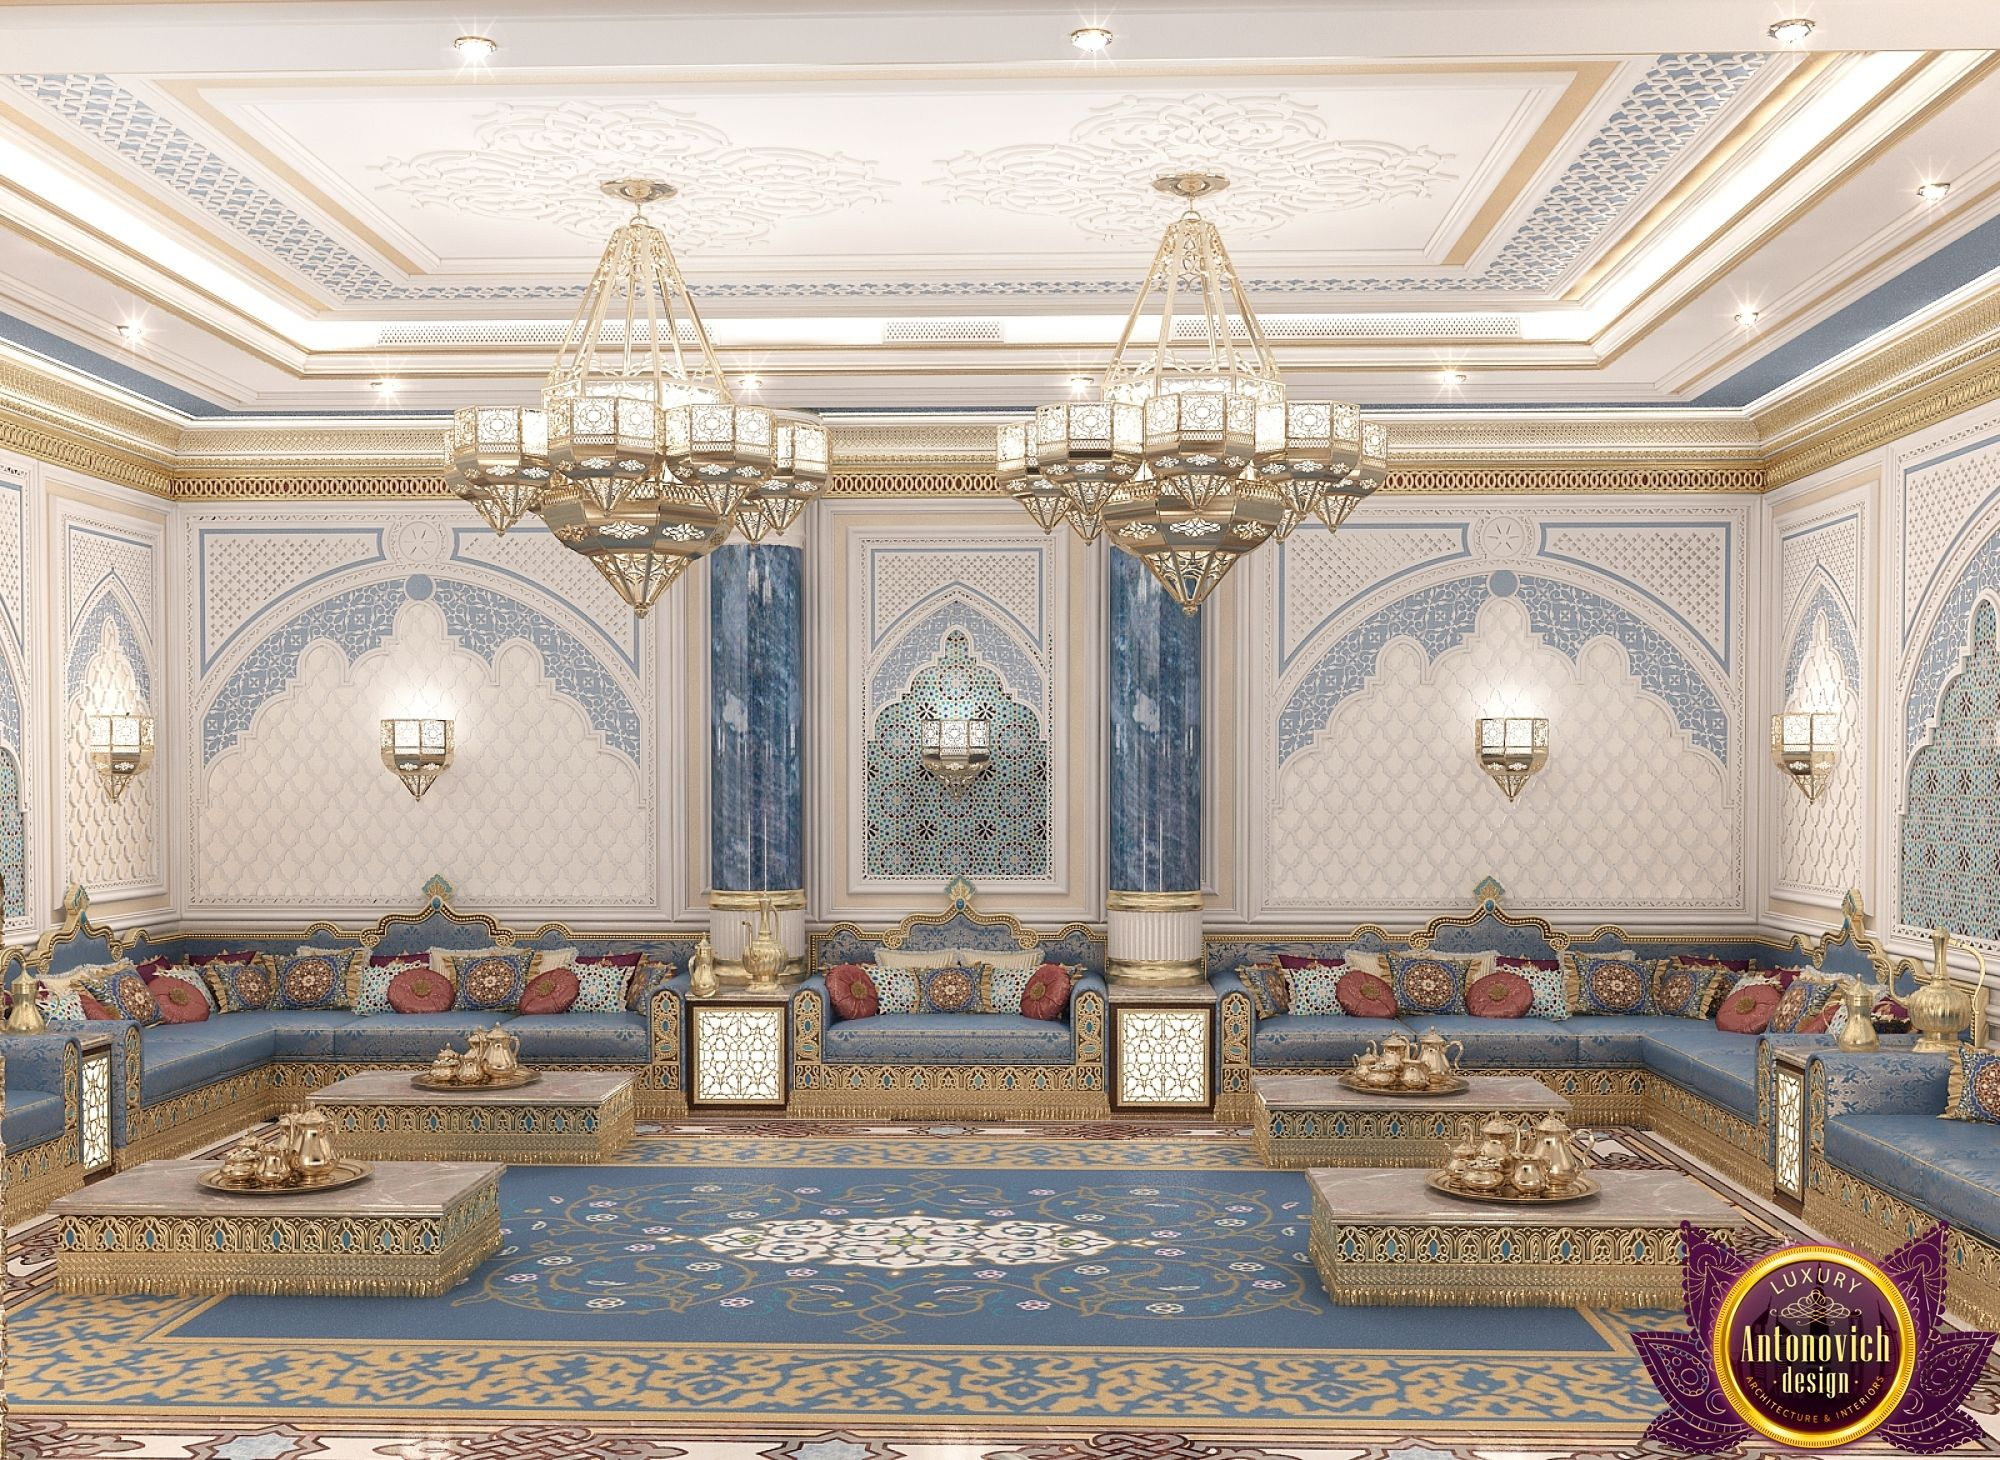 Online Sofa Set In Dubai Single Futons Beds Majlis Interior Design Luxury Arabic